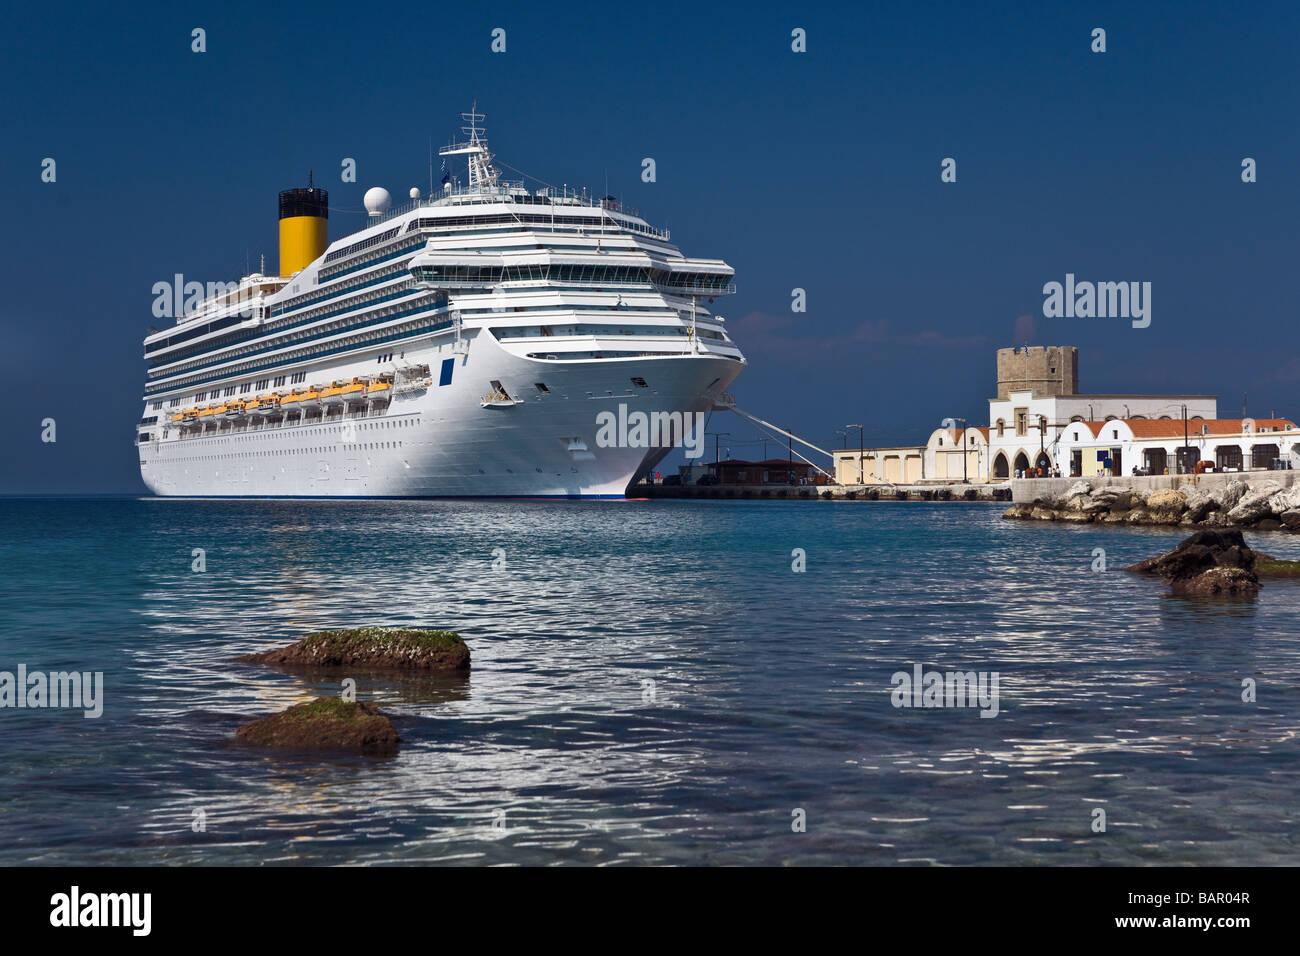 Cruise liner next to Rhodes sea coast, Greece - Stock Image